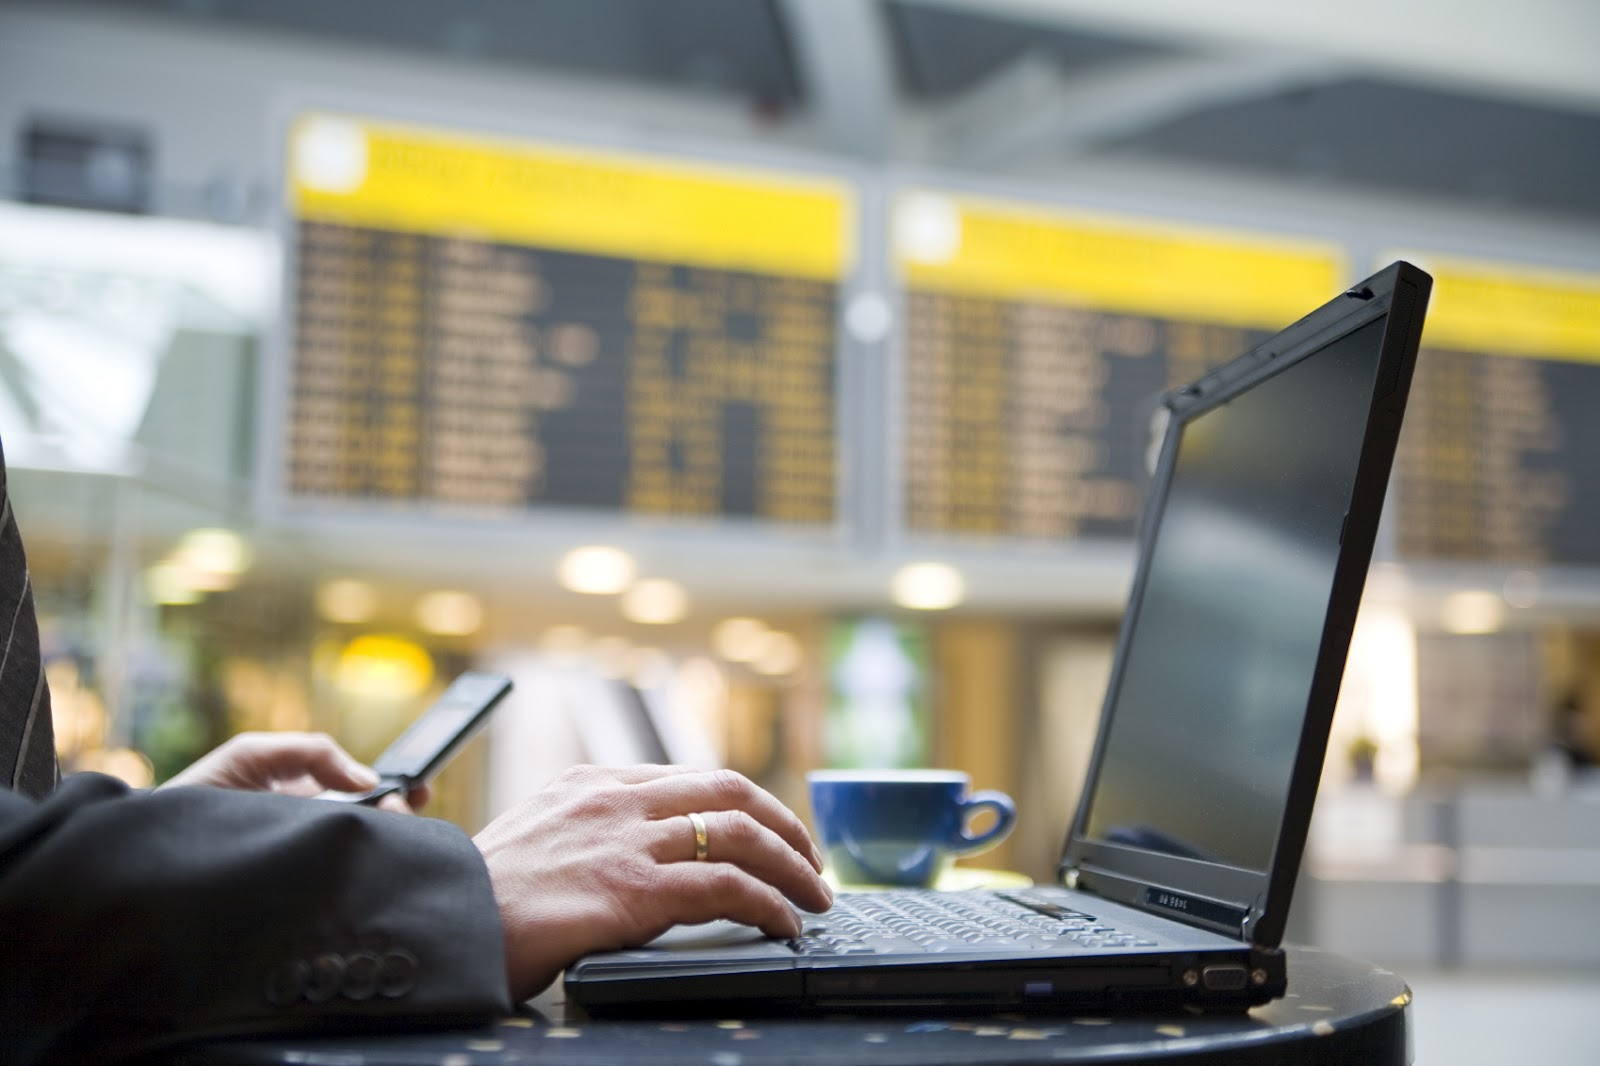 2014_07_Laptop-at-airport